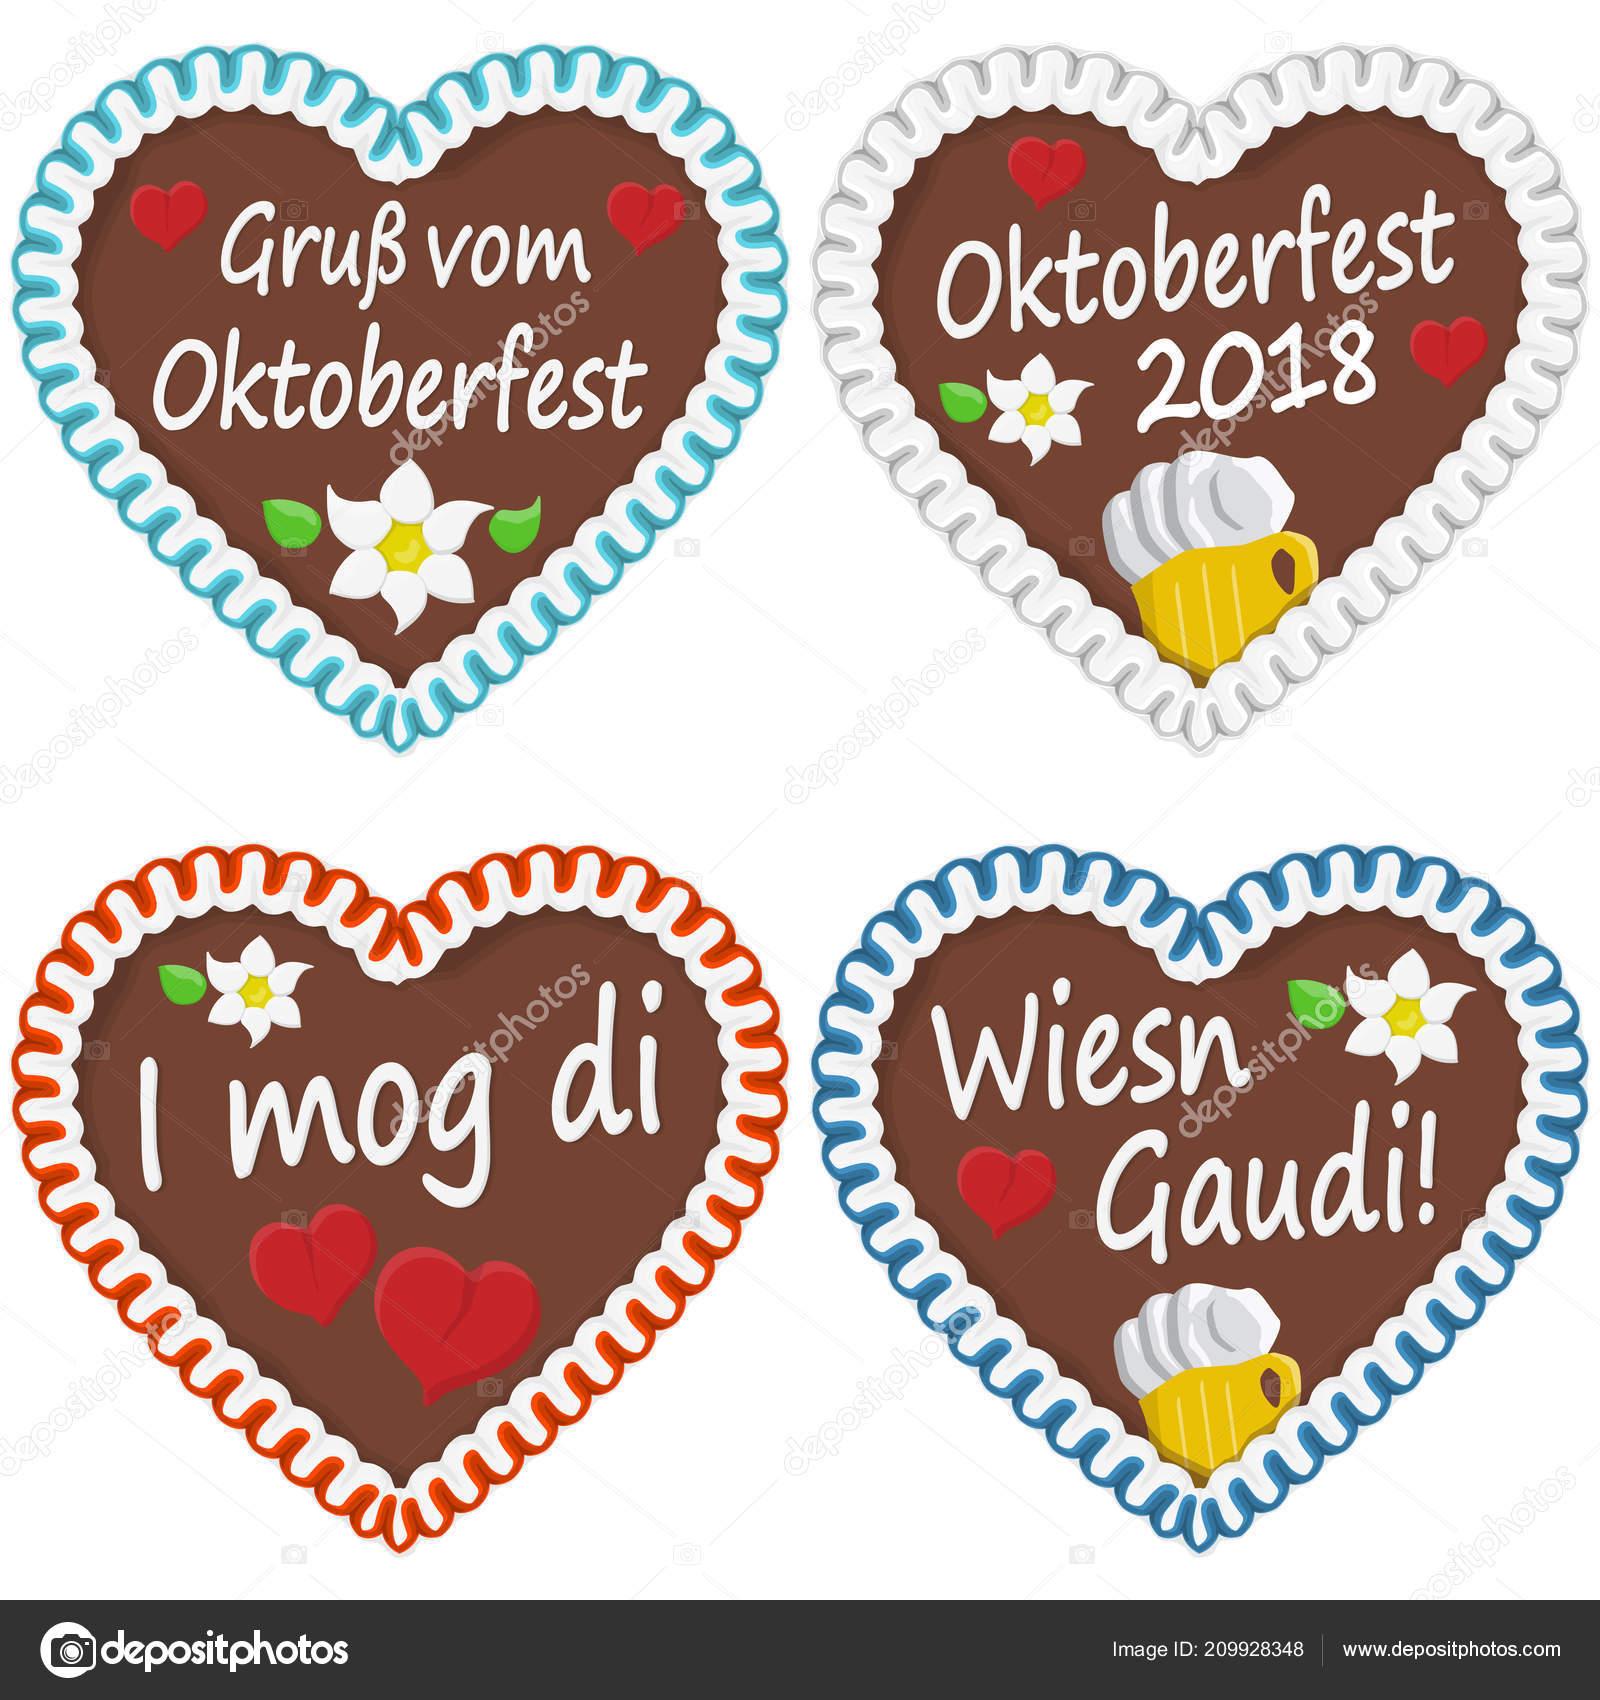 Illustrated Gingerbread Hearts Text German Oktoberfest 2018 Time